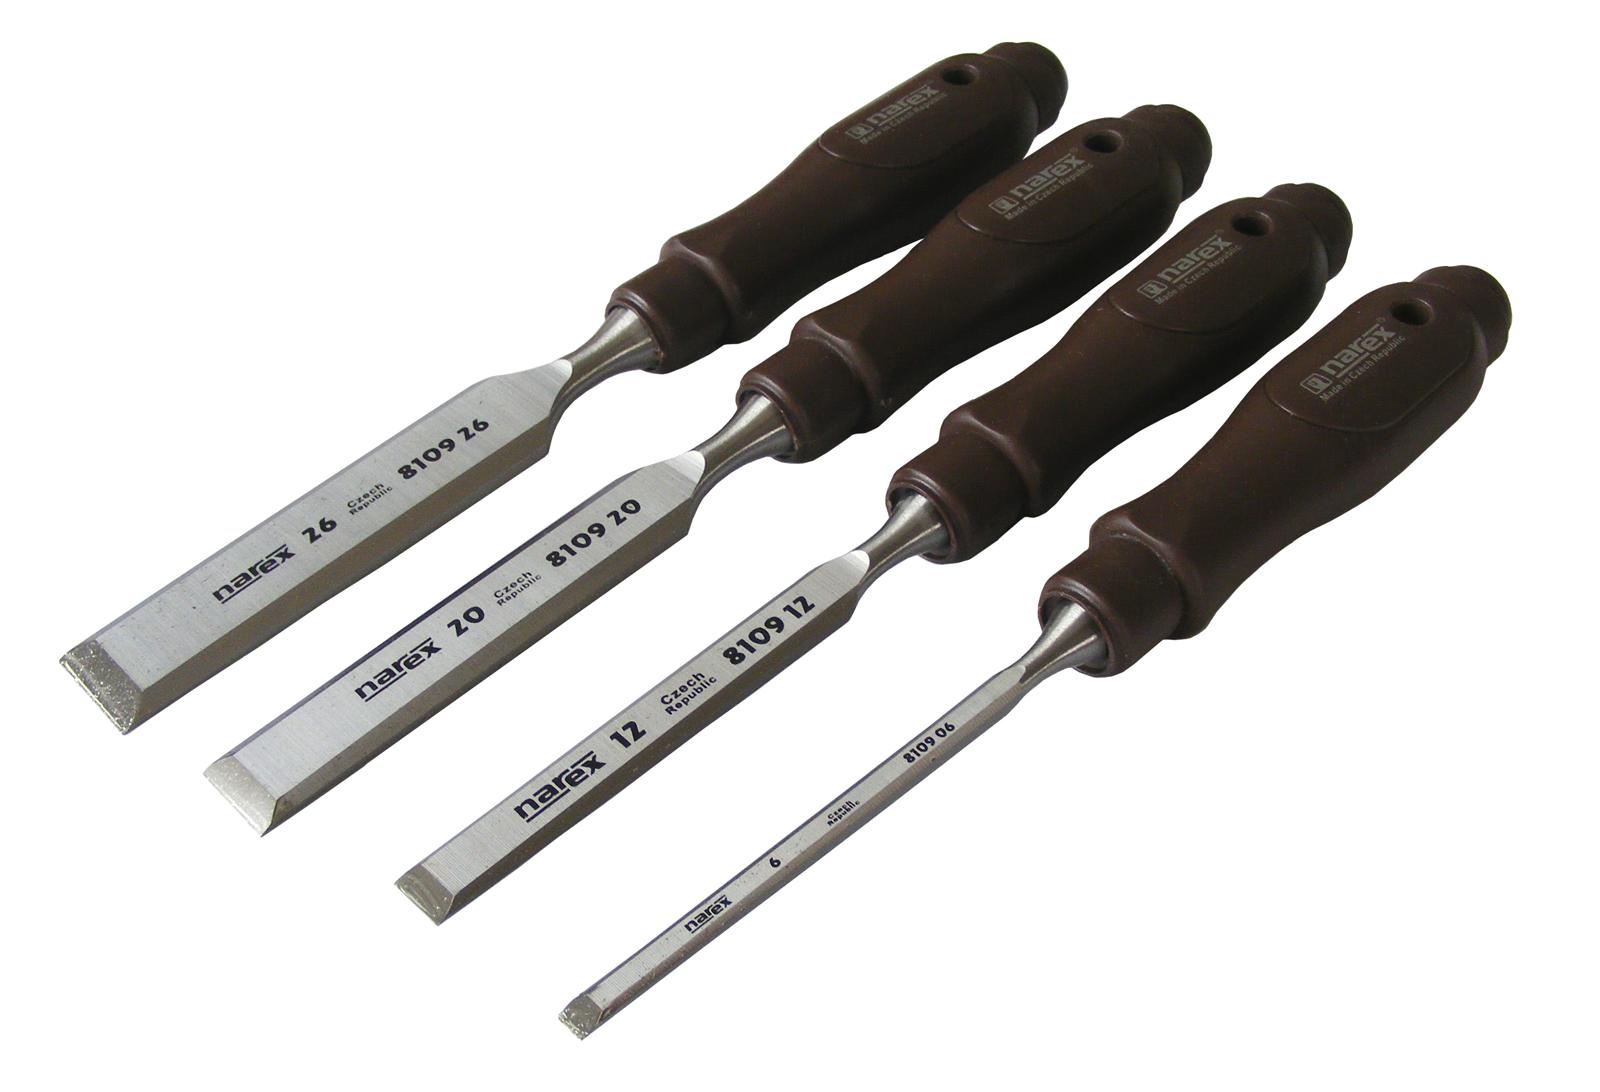 details about narex chisel set 4 piece (6 / 12/20/26) with plastic handle